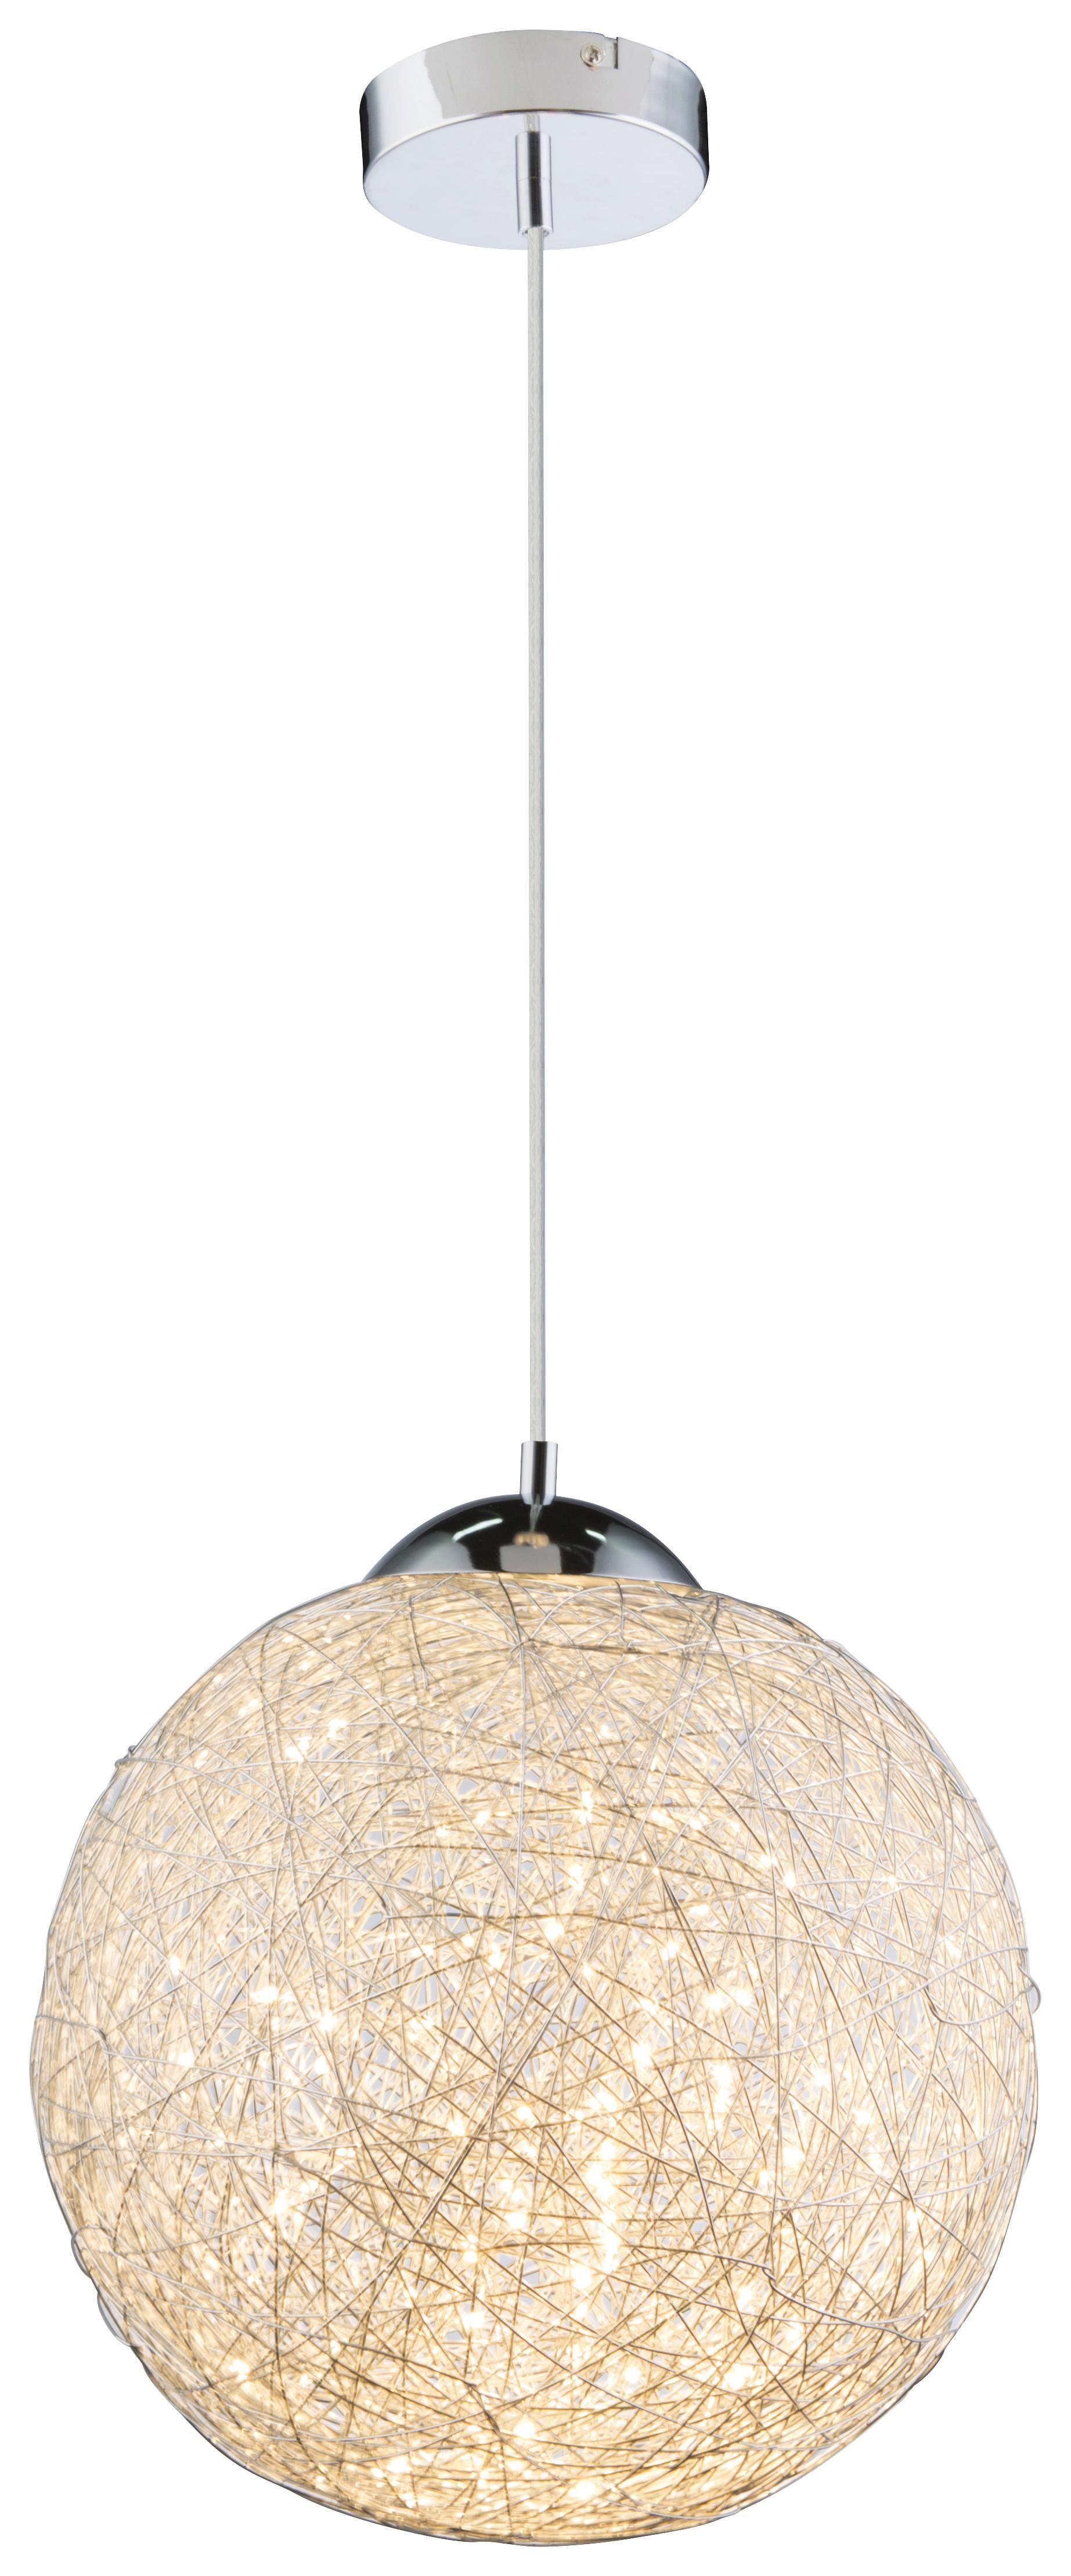 LED-hängeleuchte Tuza Ø 30 cm - MODERN, Metall (30/150cm)